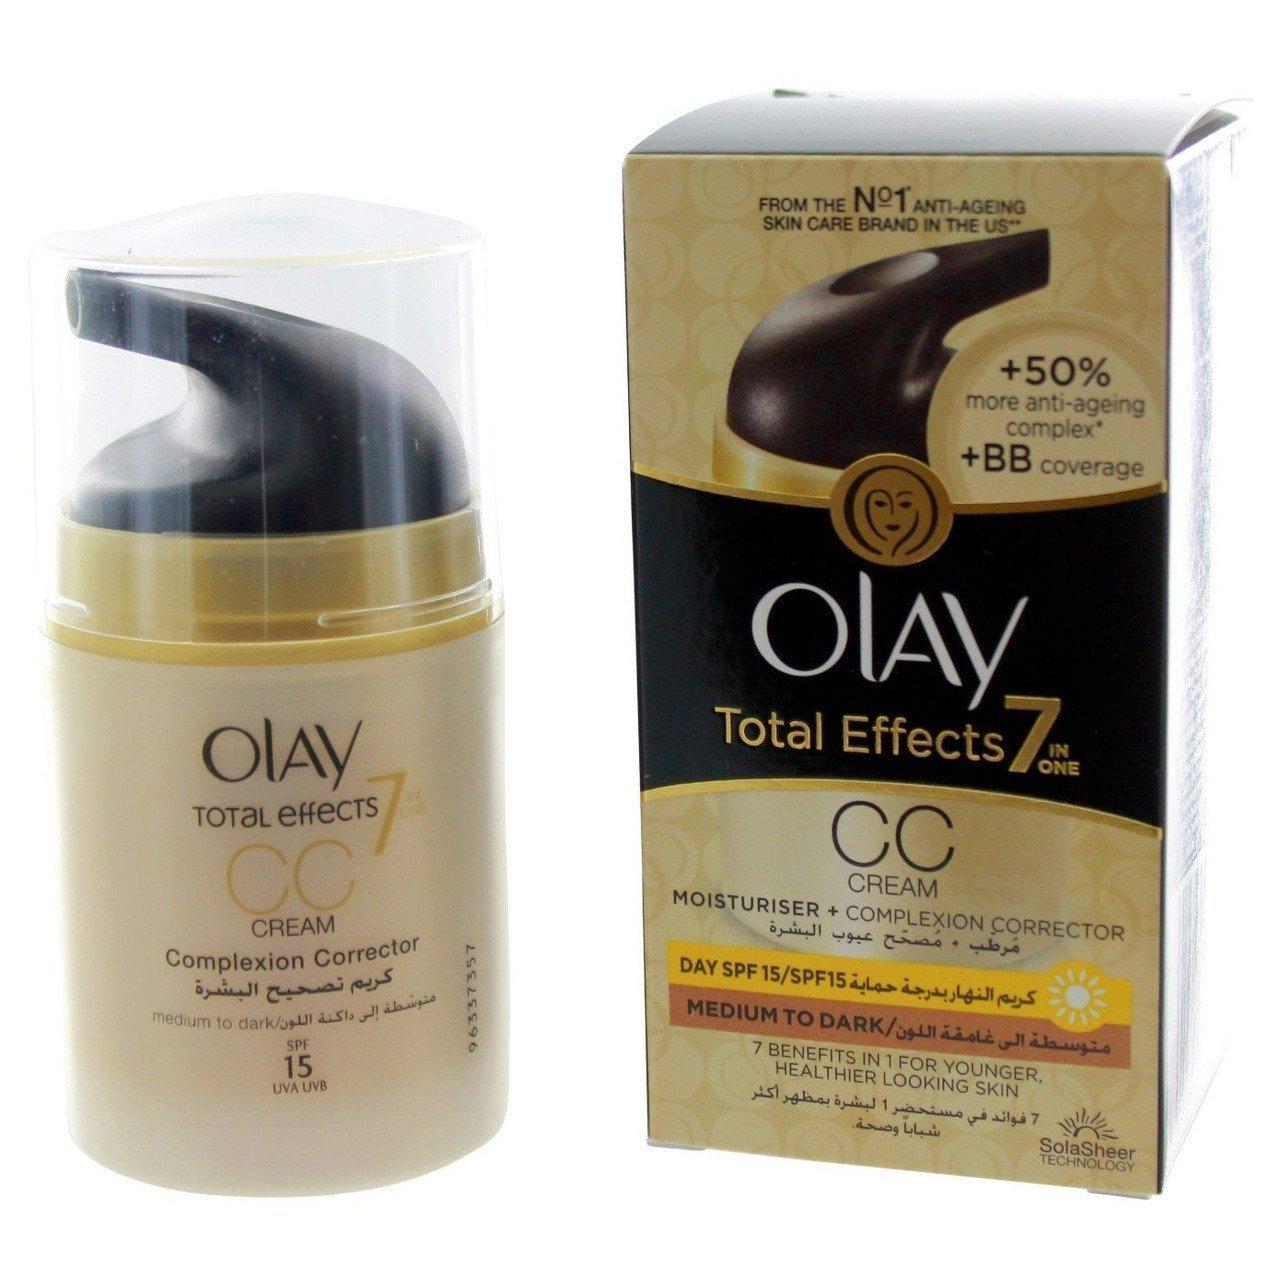 Olay Total Effects 7-In-1 Anti-Aging Moisturizer CC Cream with SPF 15 - Medium To Dark Shade - 1.7oz / 50ml Bottle